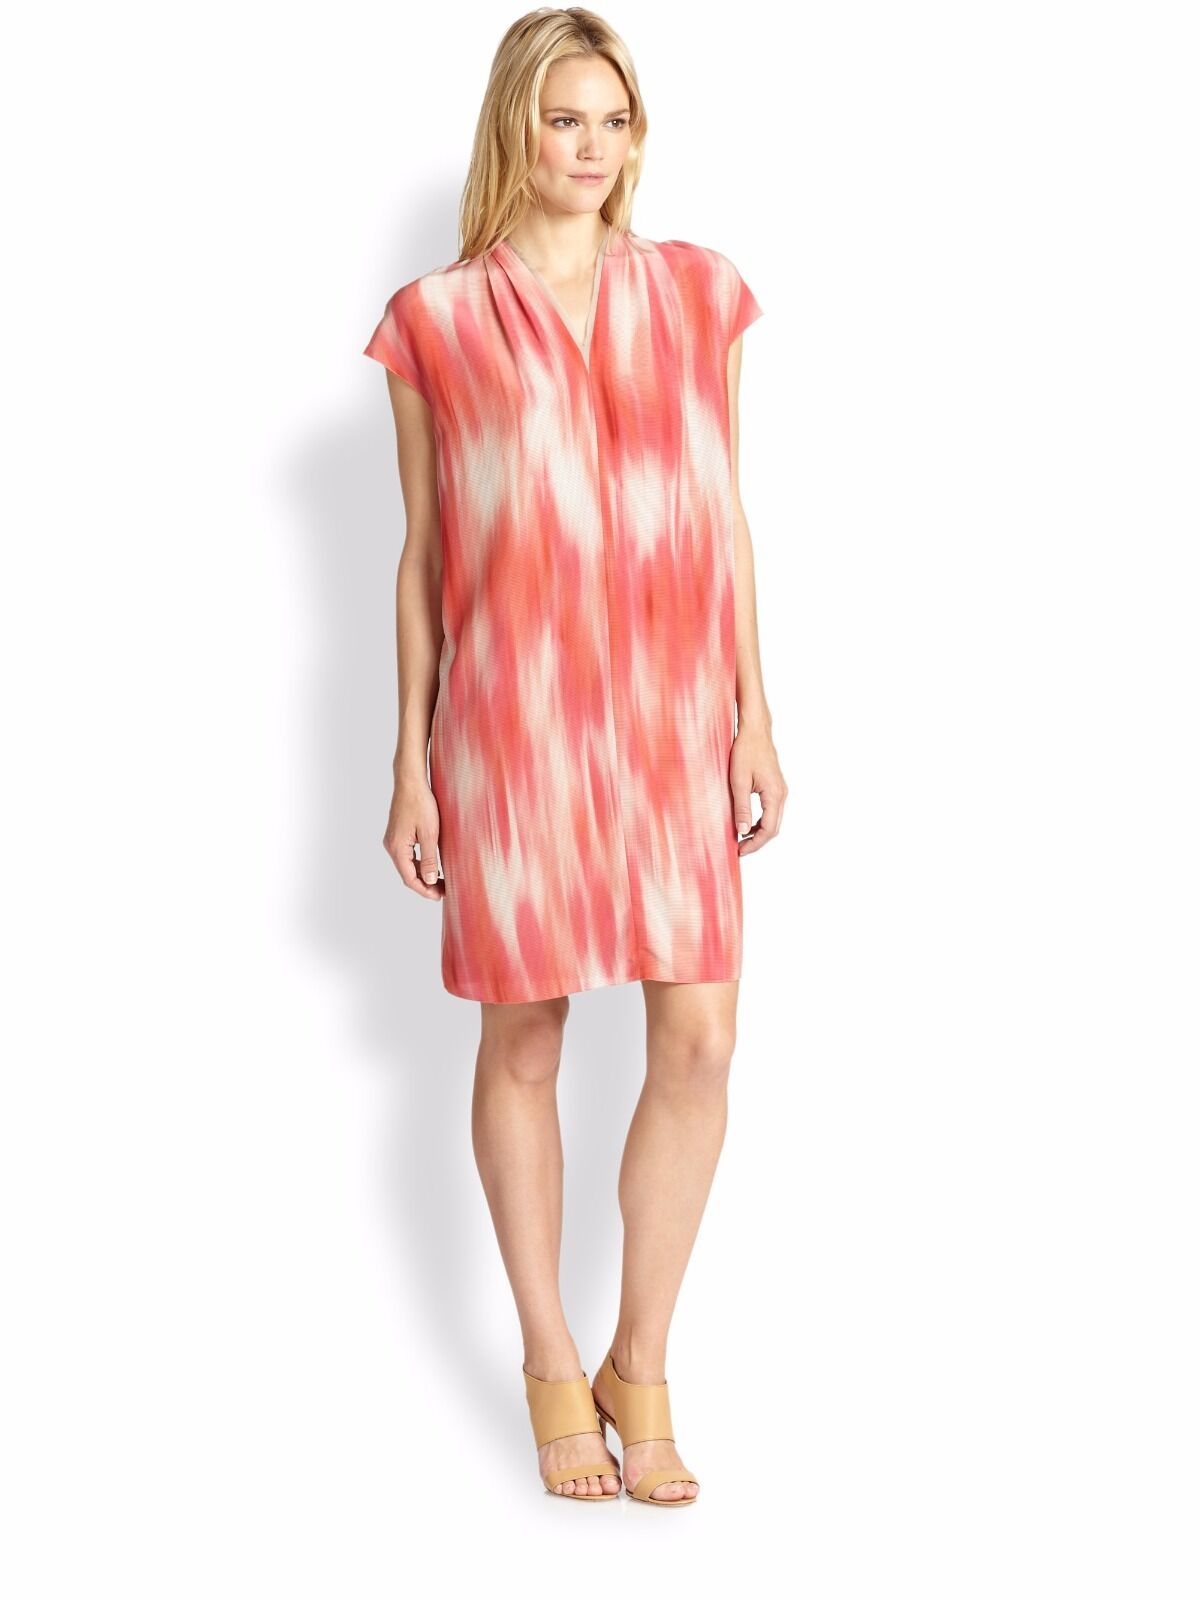 Elie Tahari Dallas Coral Reef Printed 100% Silk Stylish Shift Dress. NWT Meadium